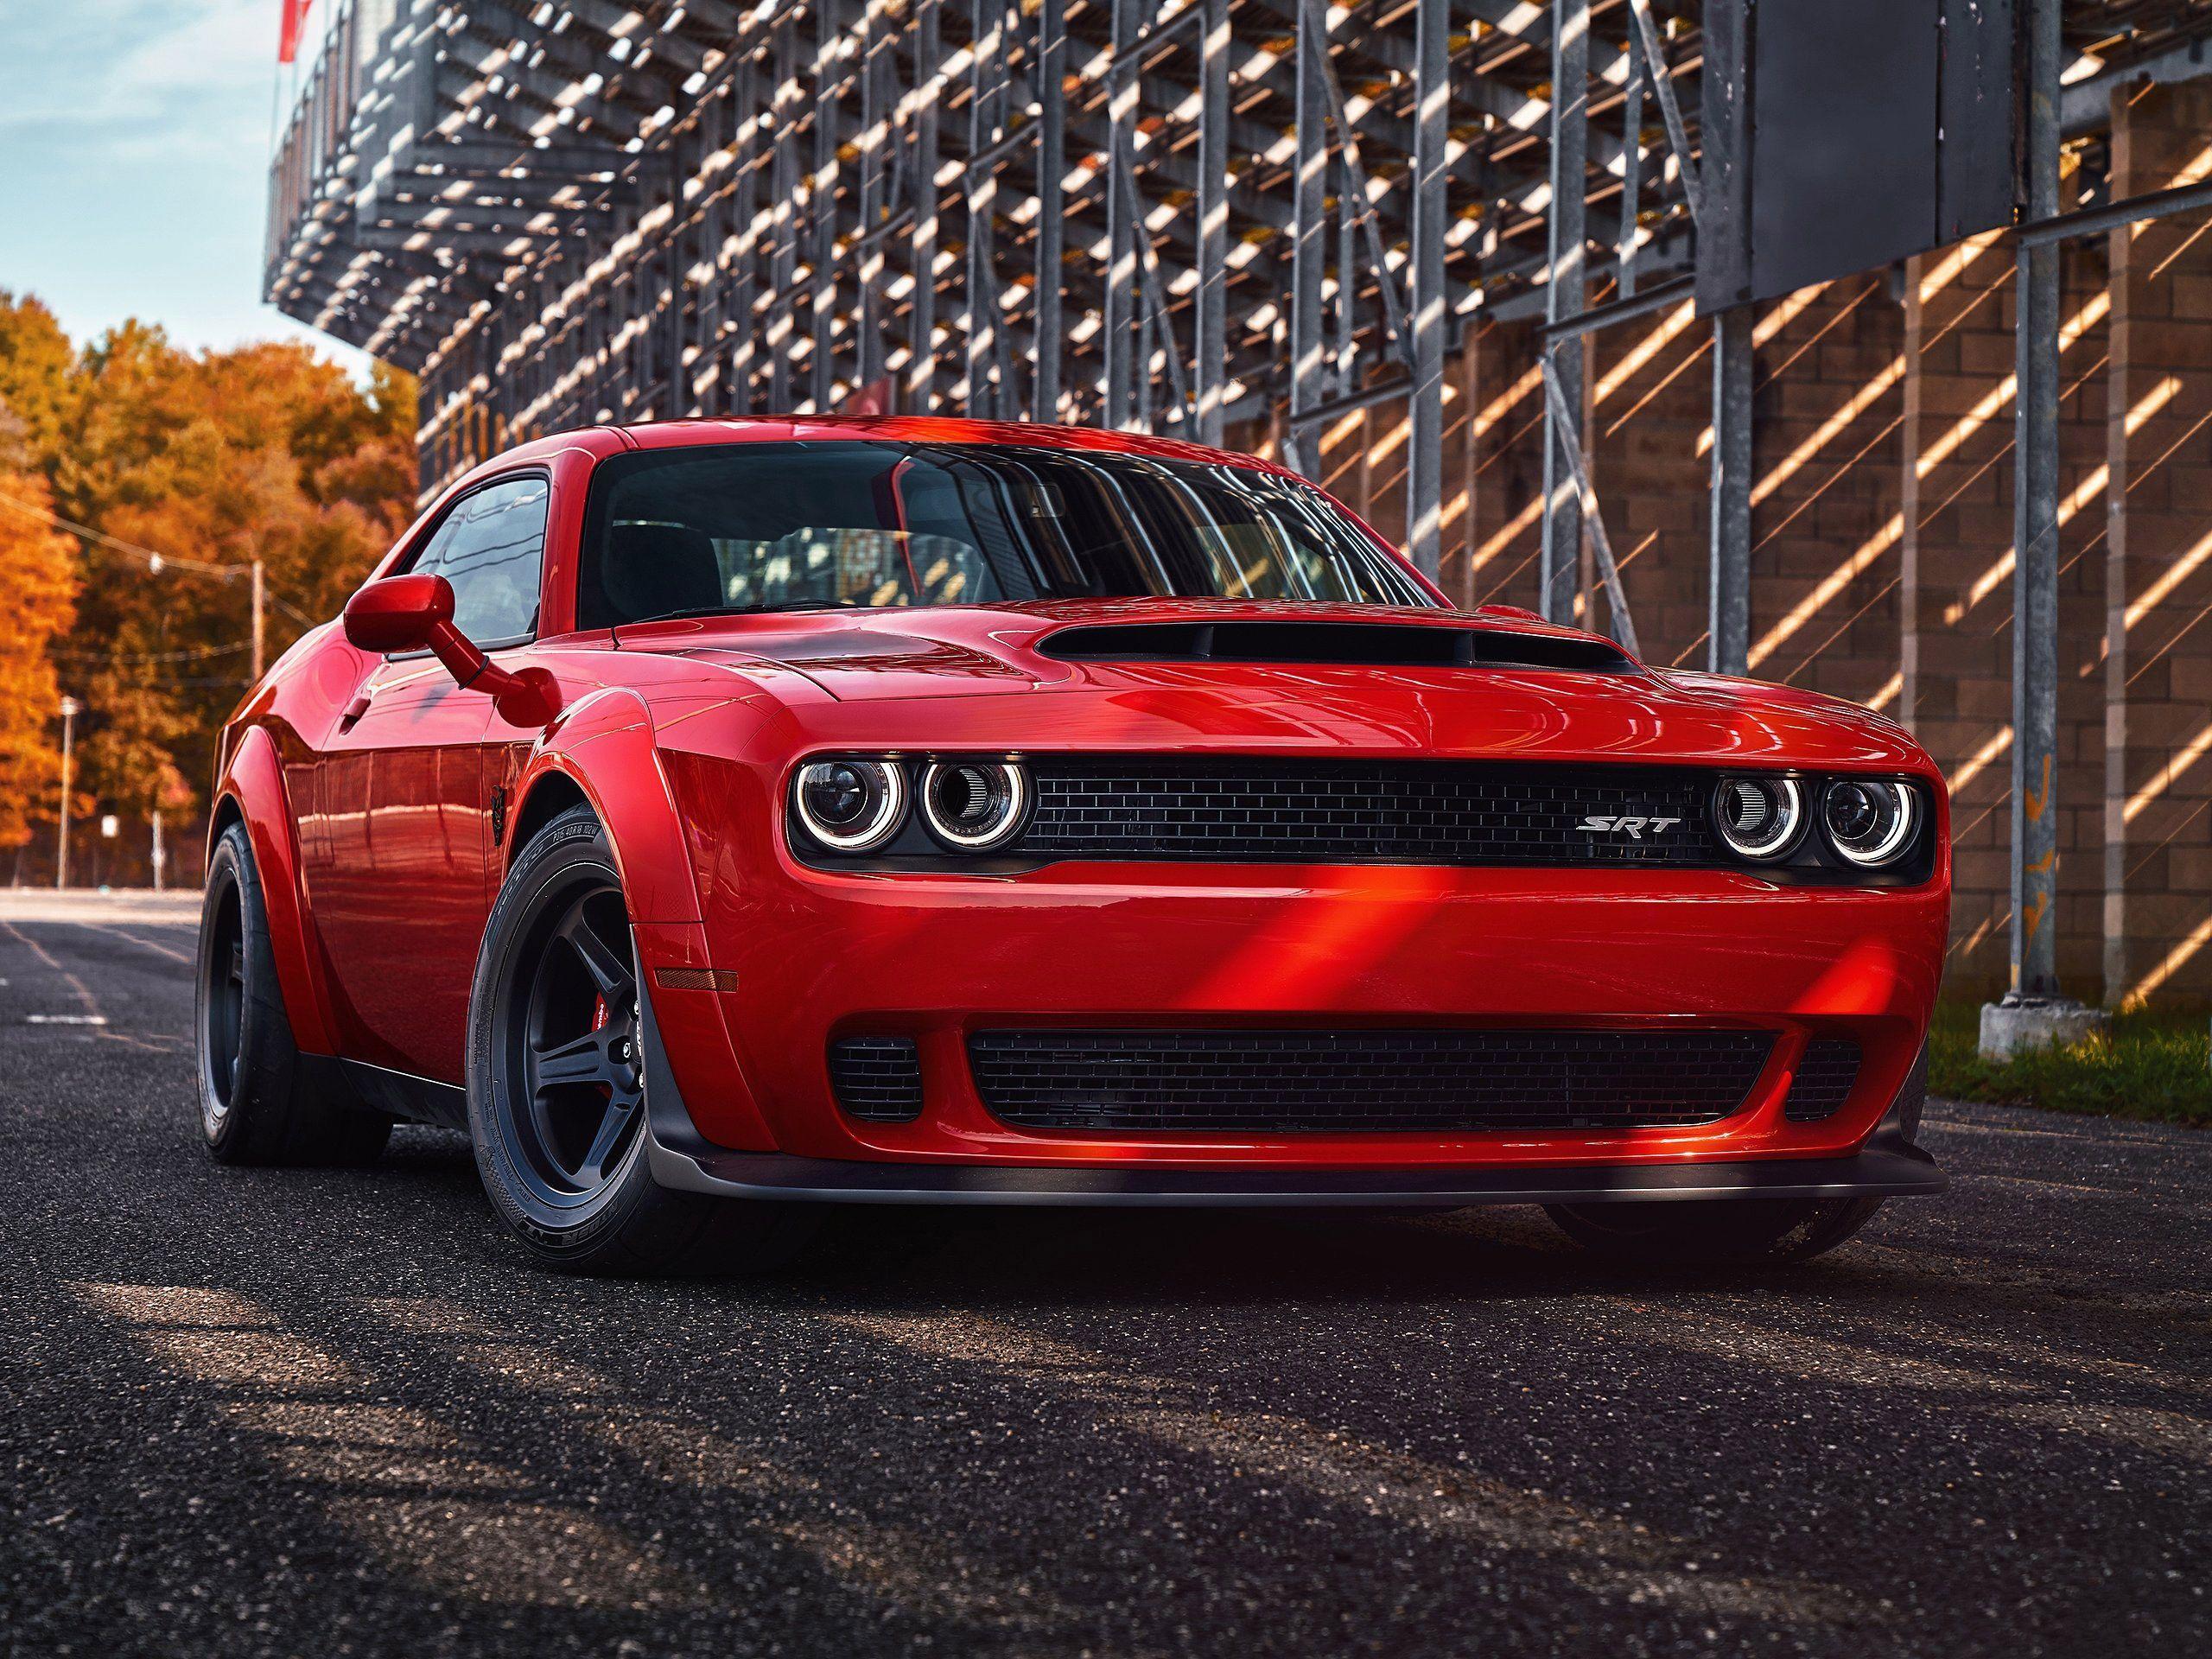 Dodge 4k Wallpapers Top Free Dodge 4k Backgrounds Wallpaperaccess